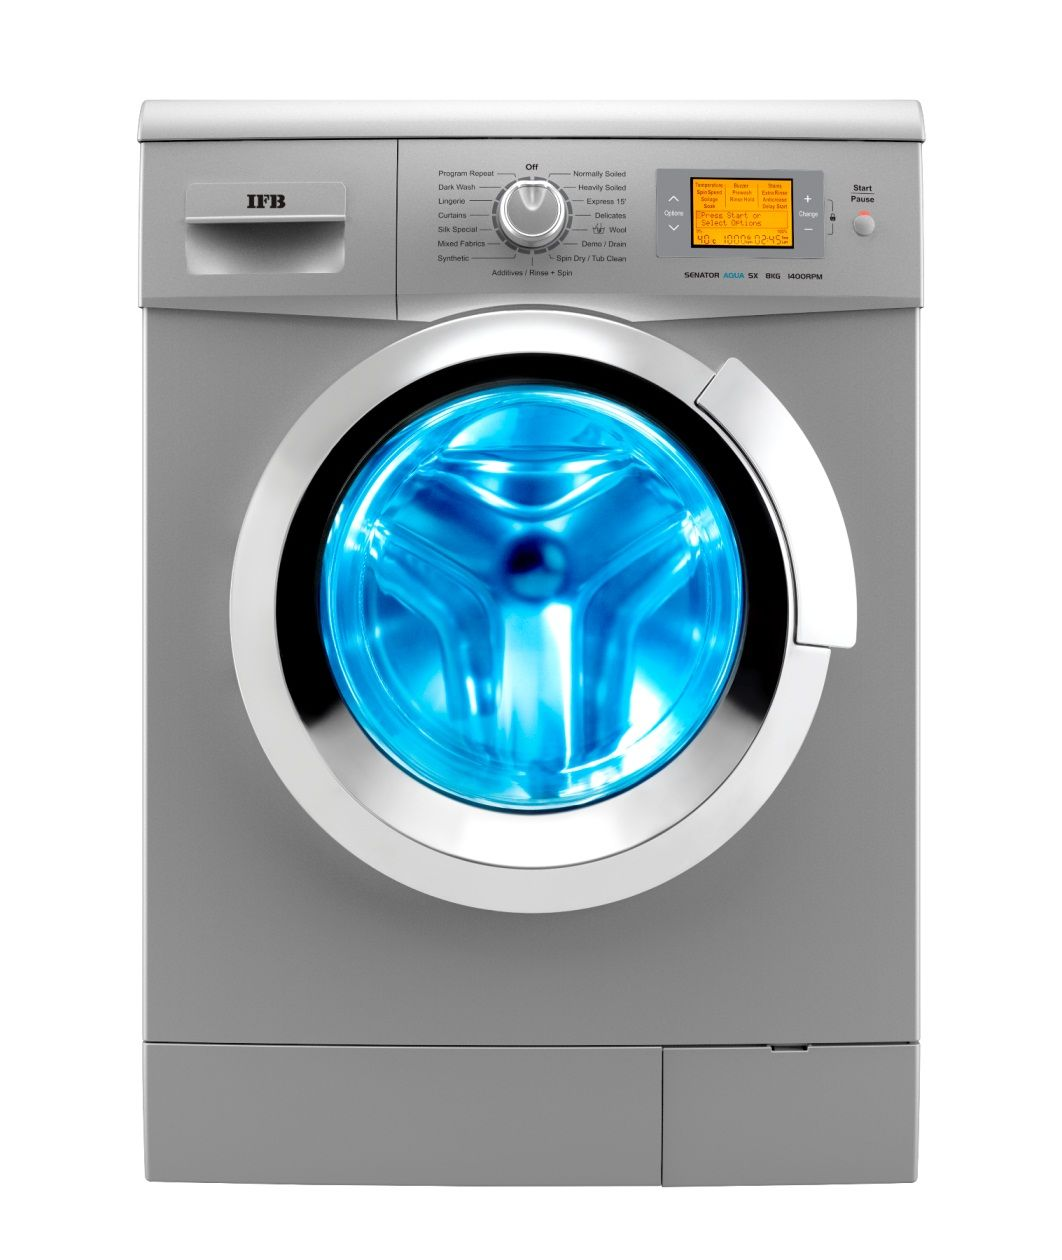 Https Www Google Com Search Q Washing Machine Concepts Fully Automatic Washing Machine Buy Washing Machine Automatic Washing Machine